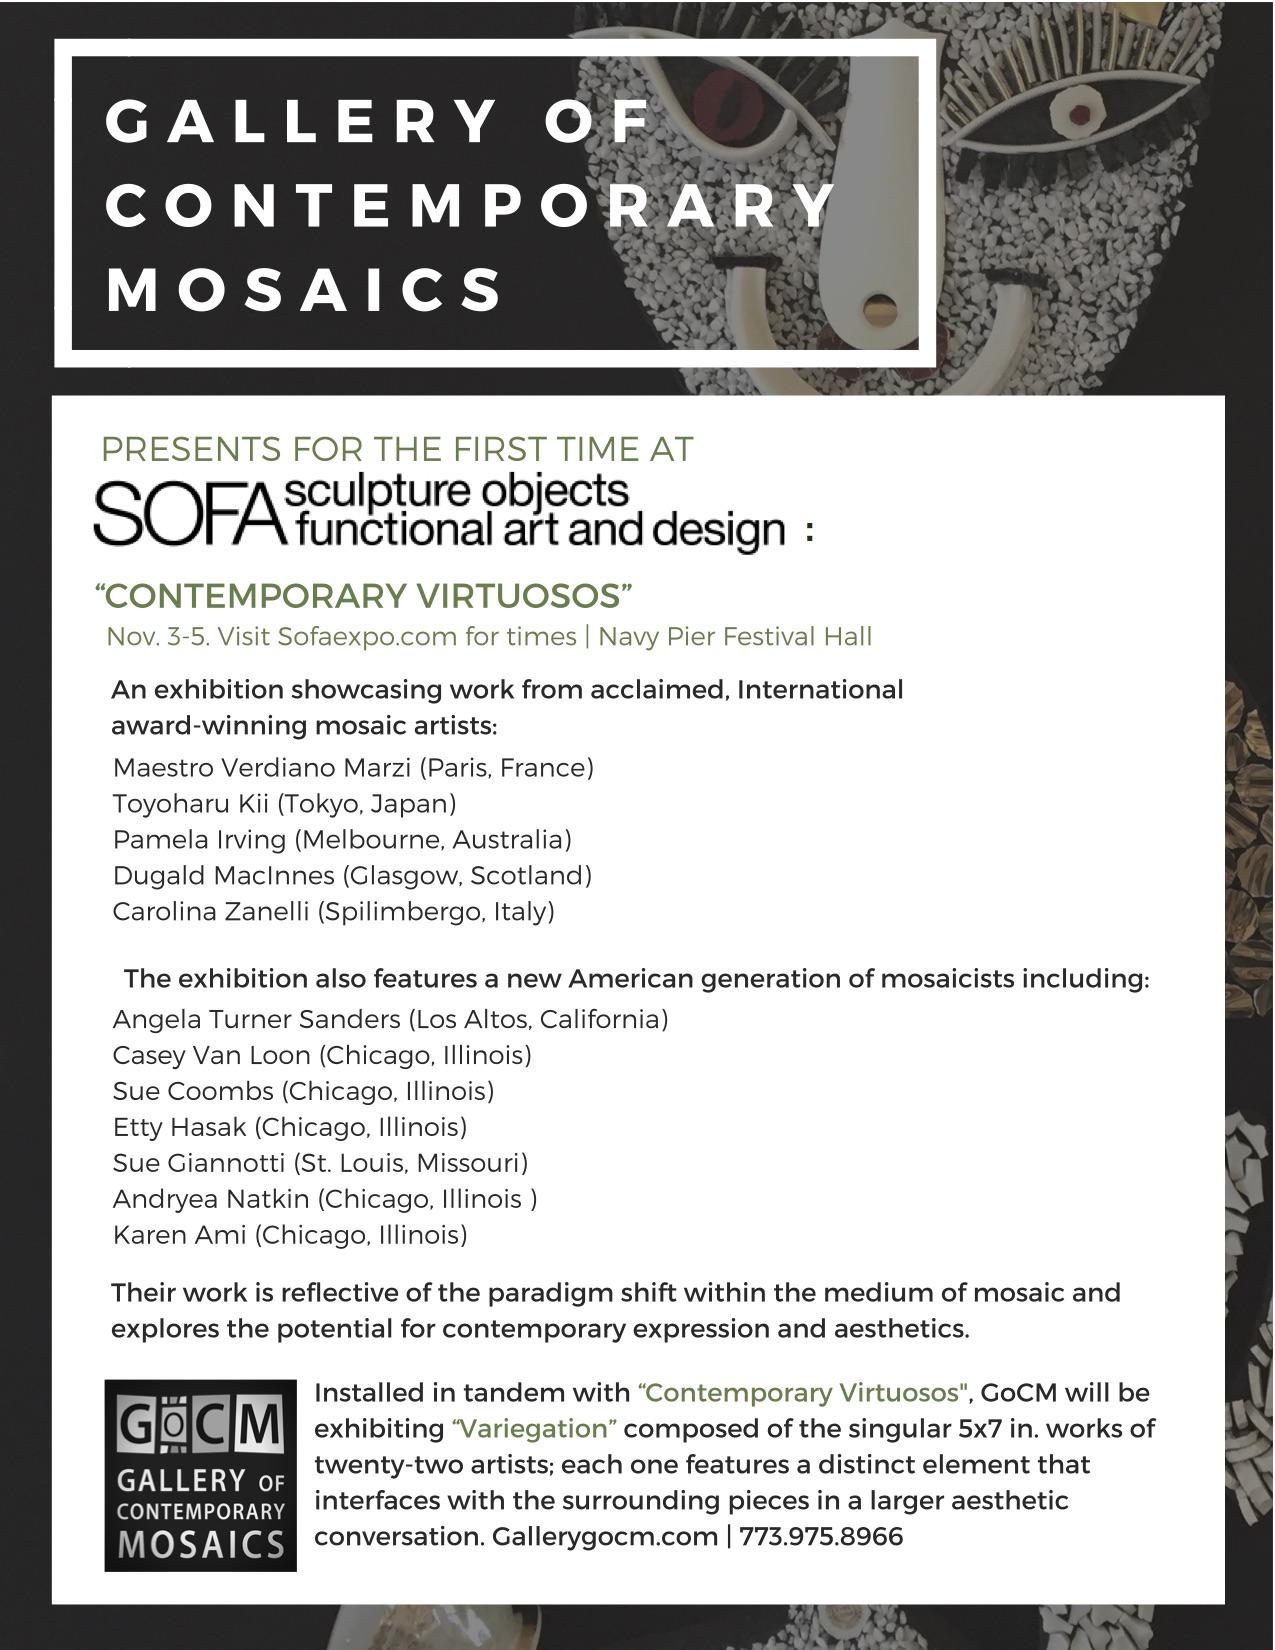 SOFA Flyer 2 final final  copy.jpg